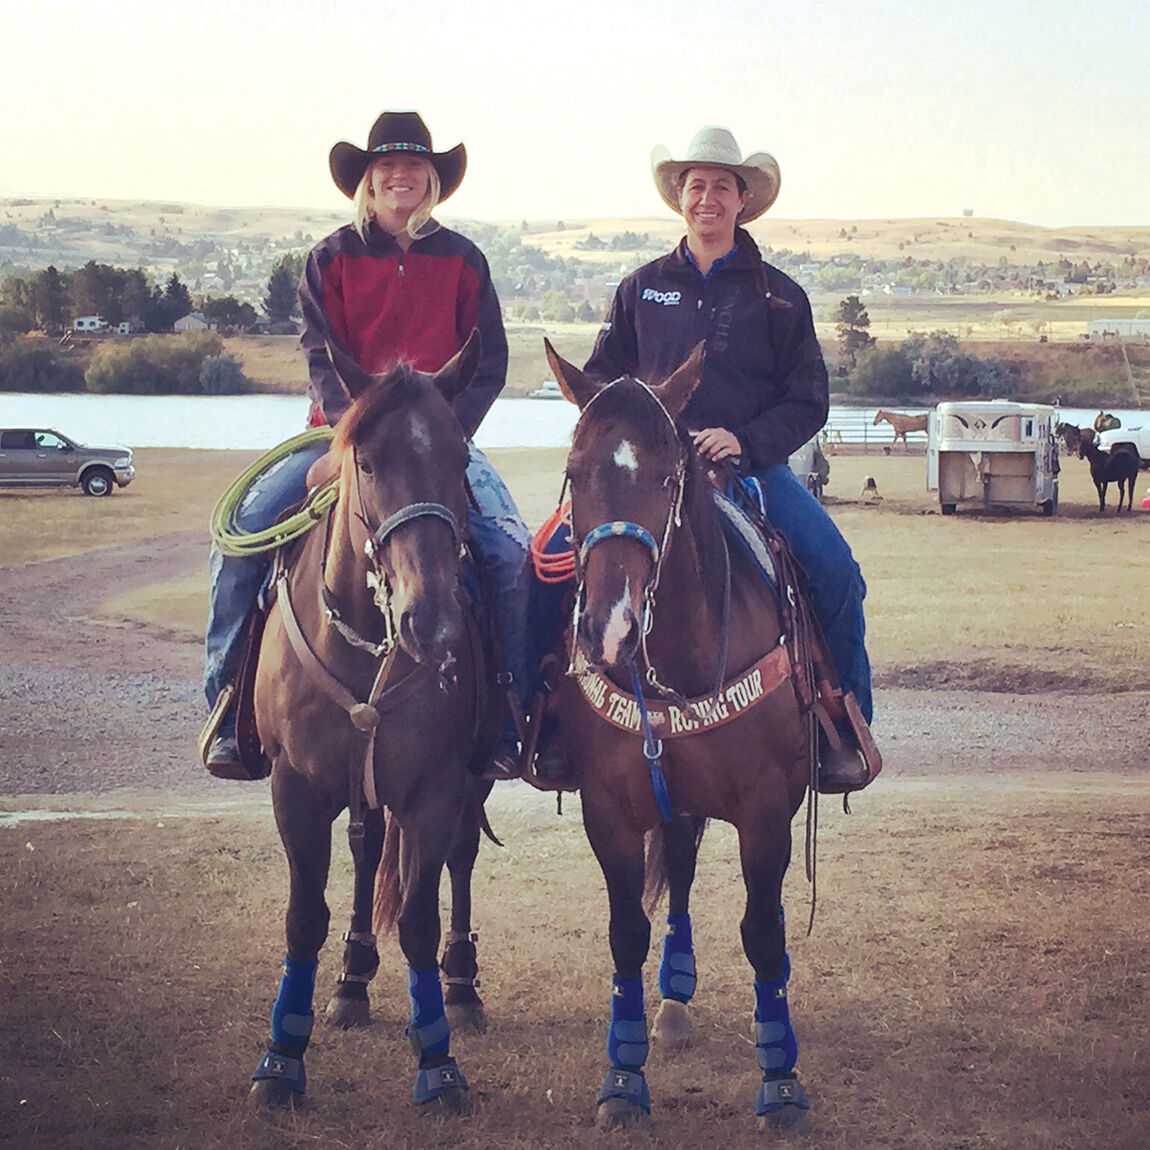 11-20-20 Mann rodeo 3.jpg